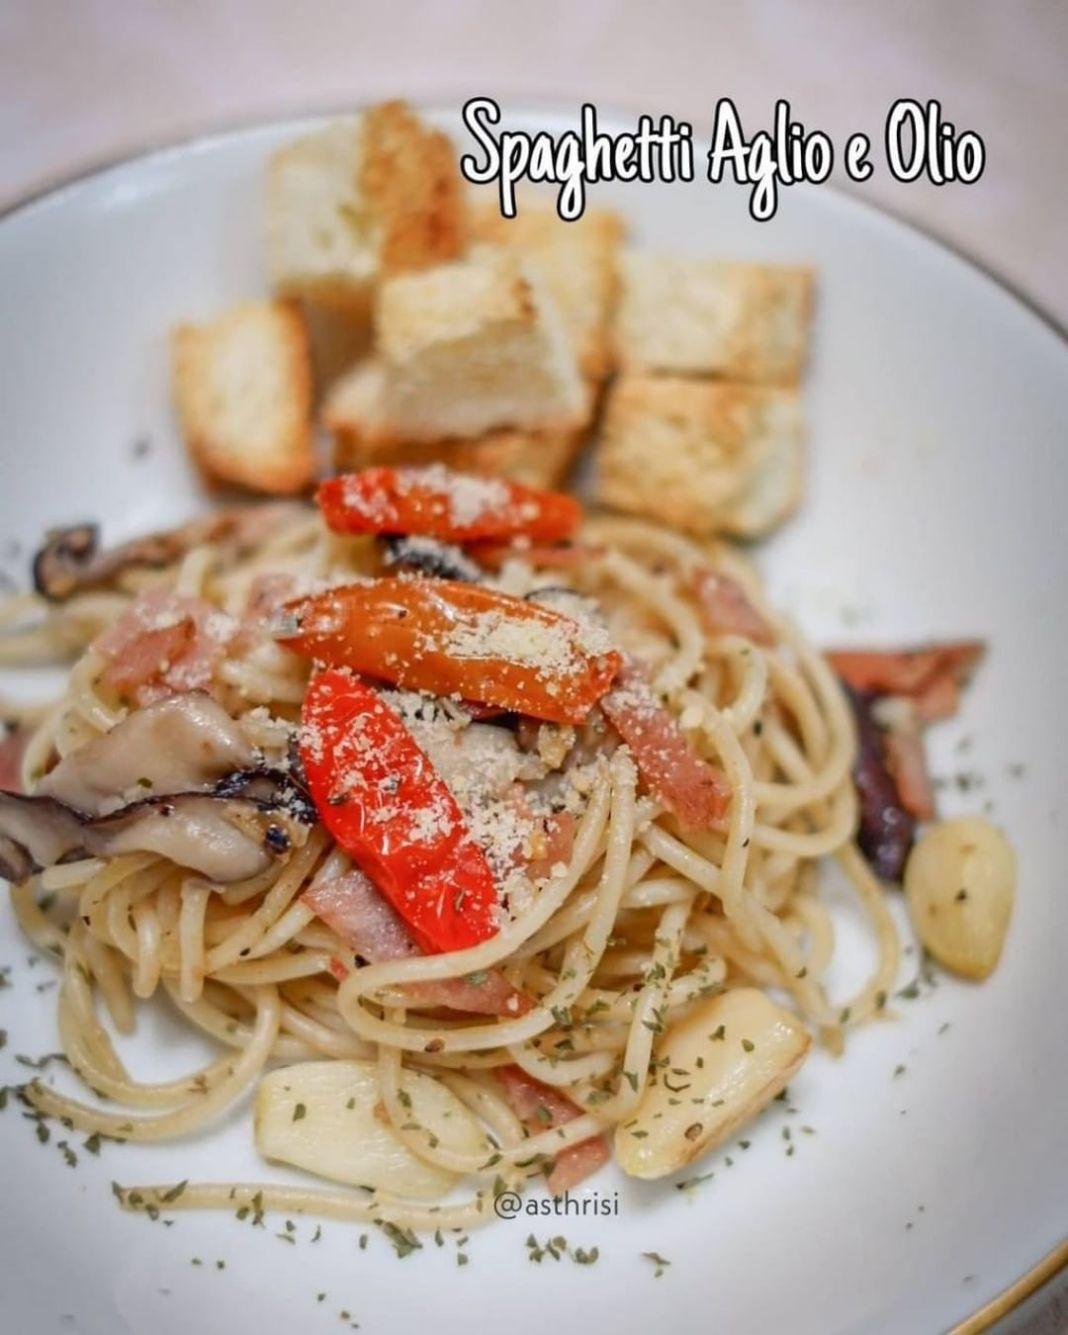 Info kuliner, Spaghetti yummyyyy  Bahan 80gr spaghetti/angel hair spaghetti 3 lembar smoked beef potong tipis…